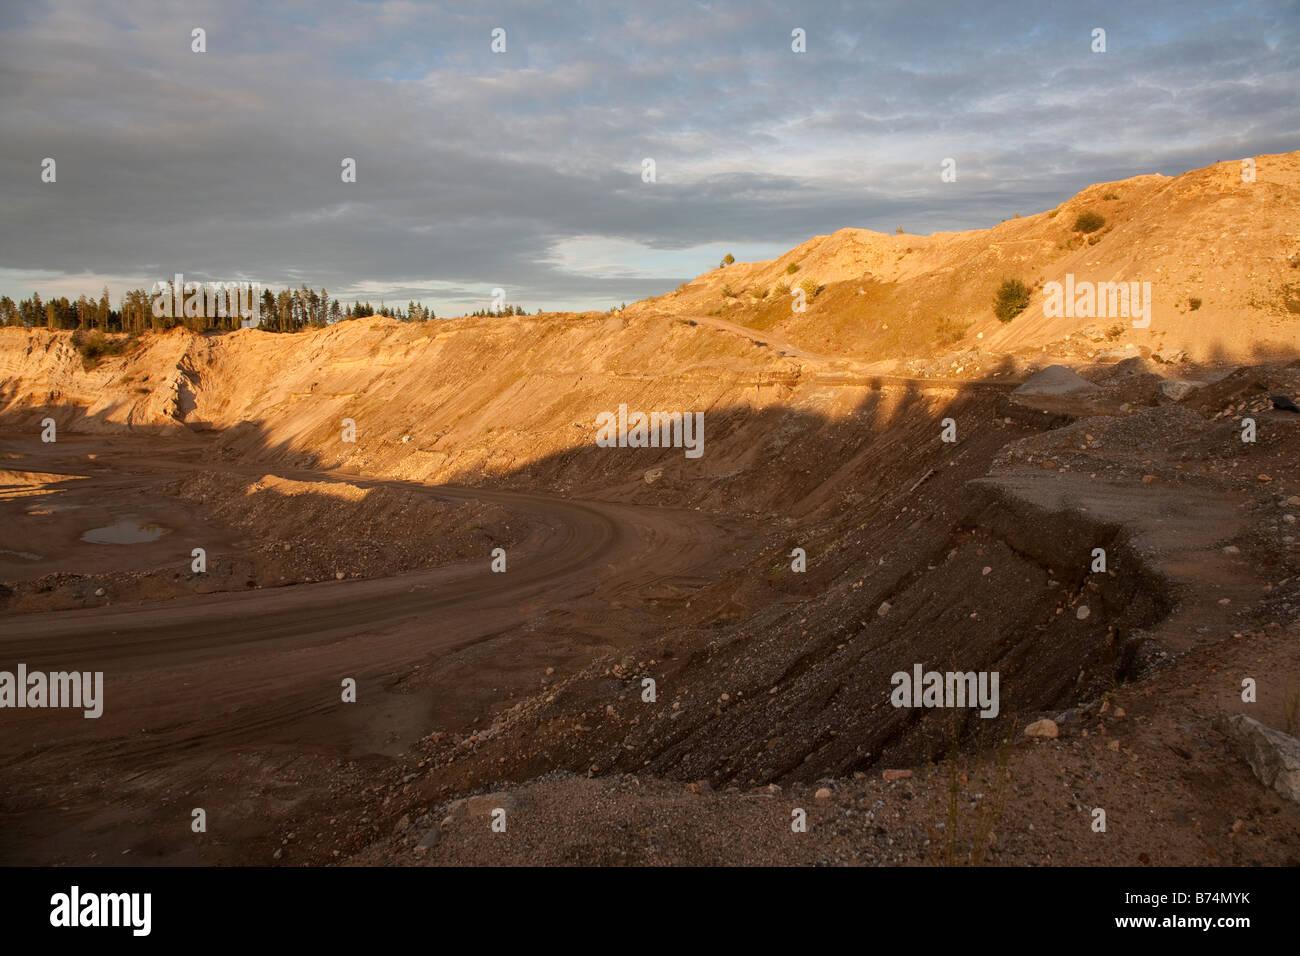 Large gravel pit on sandy ridge / esker , Finland - Stock Image